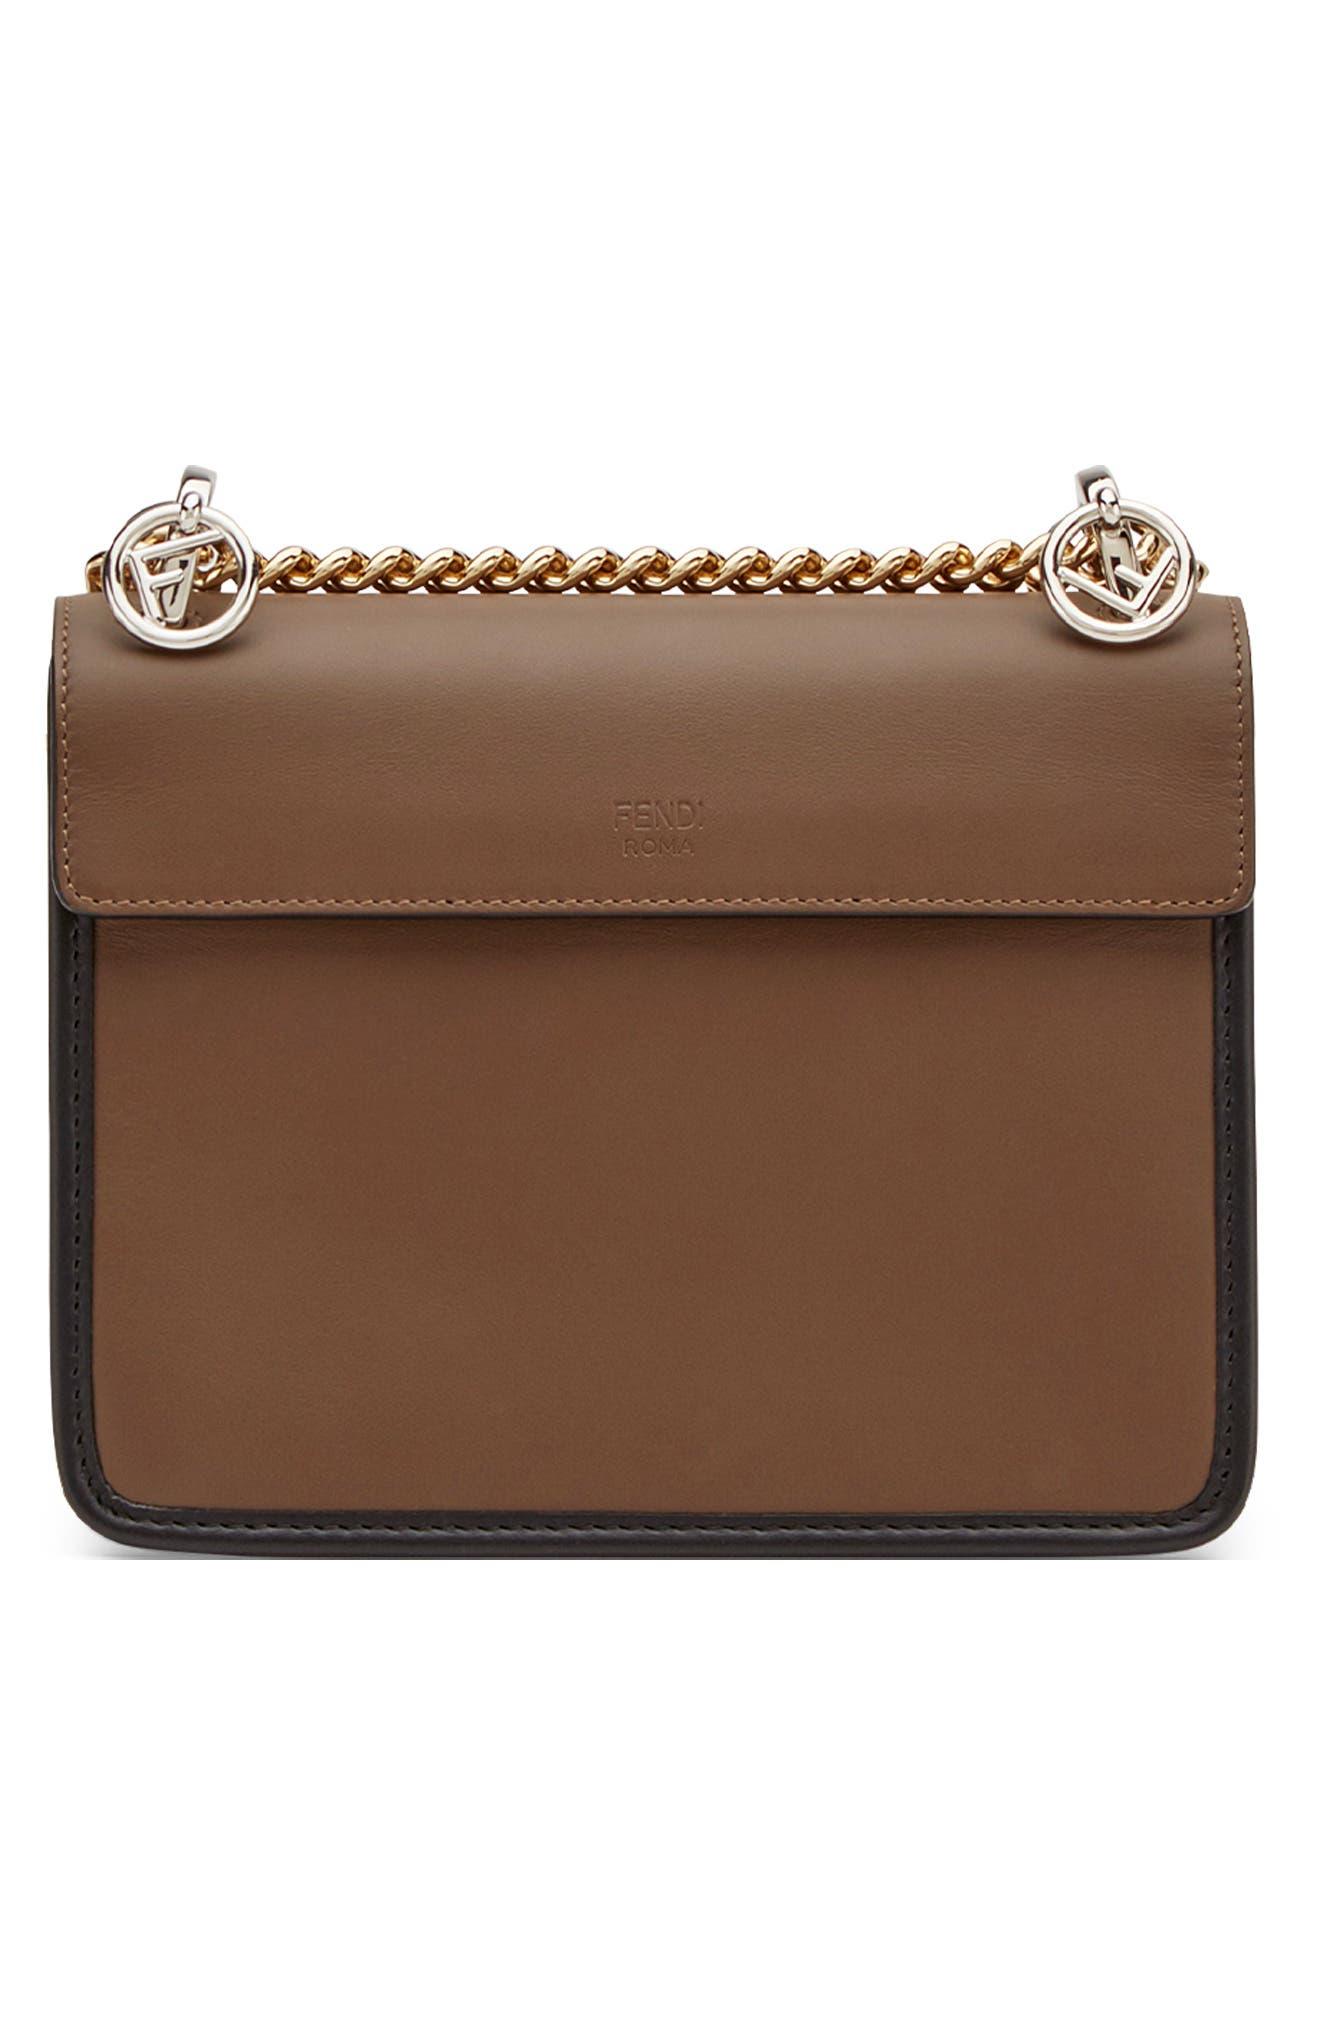 FENDI,                             Small Kan I Logo Embossed Leather Shoulder Bag,                             Alternate thumbnail 2, color,                             MAYA/ NERO